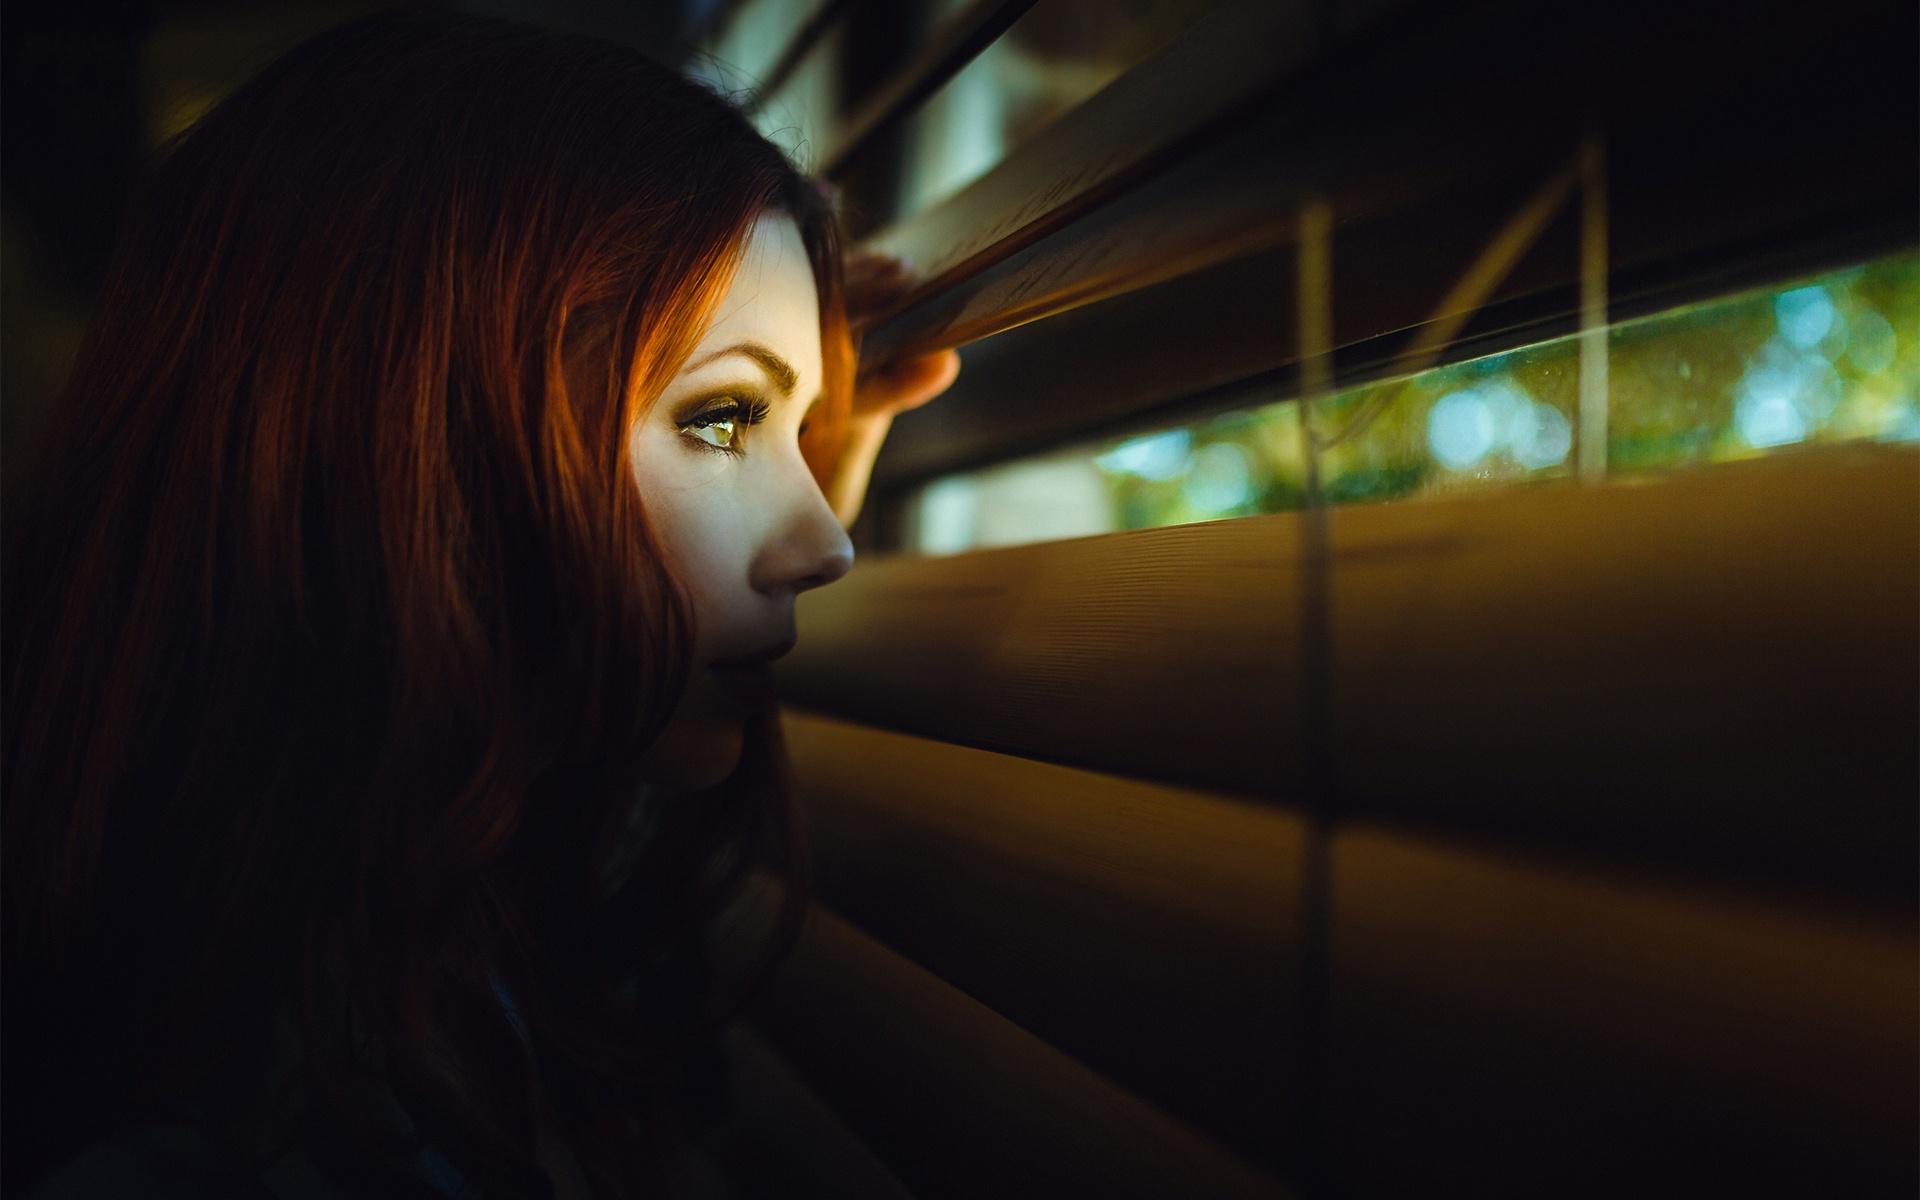 Фото девушка смотрит на фотографию